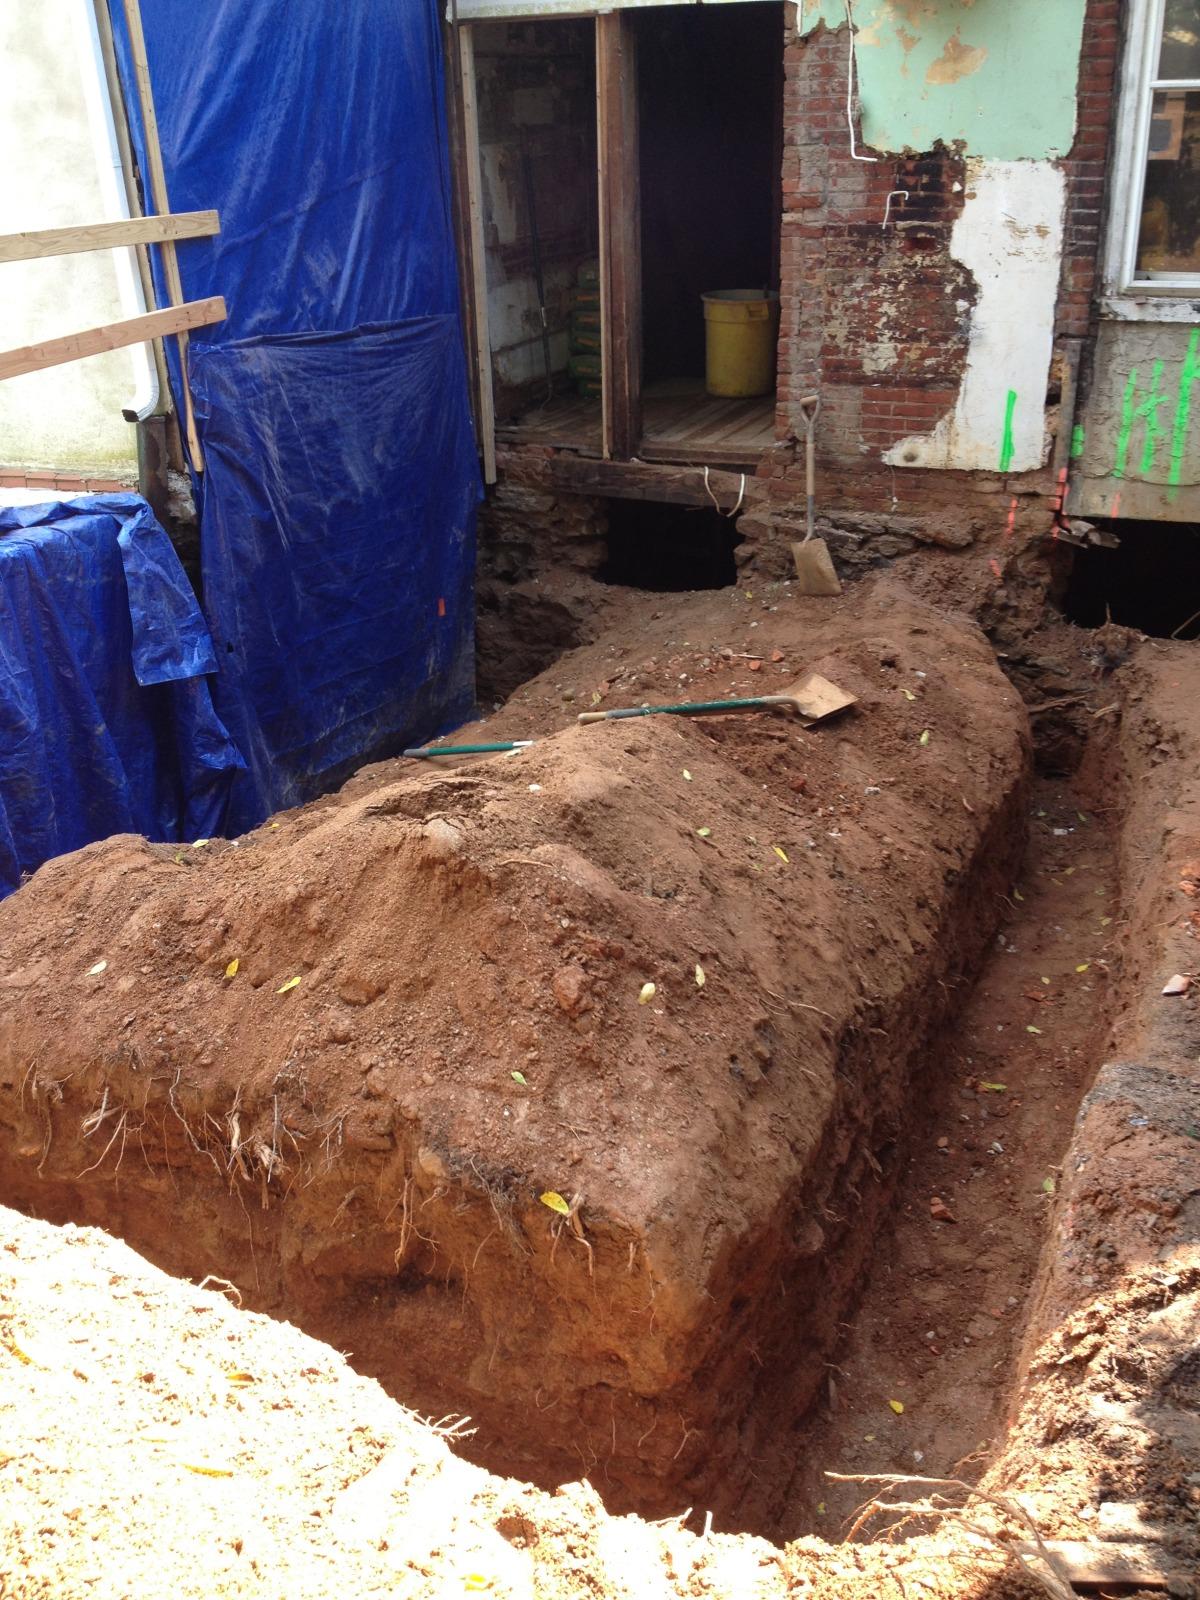 c - 3523 sunnyside foundations 3.jpg